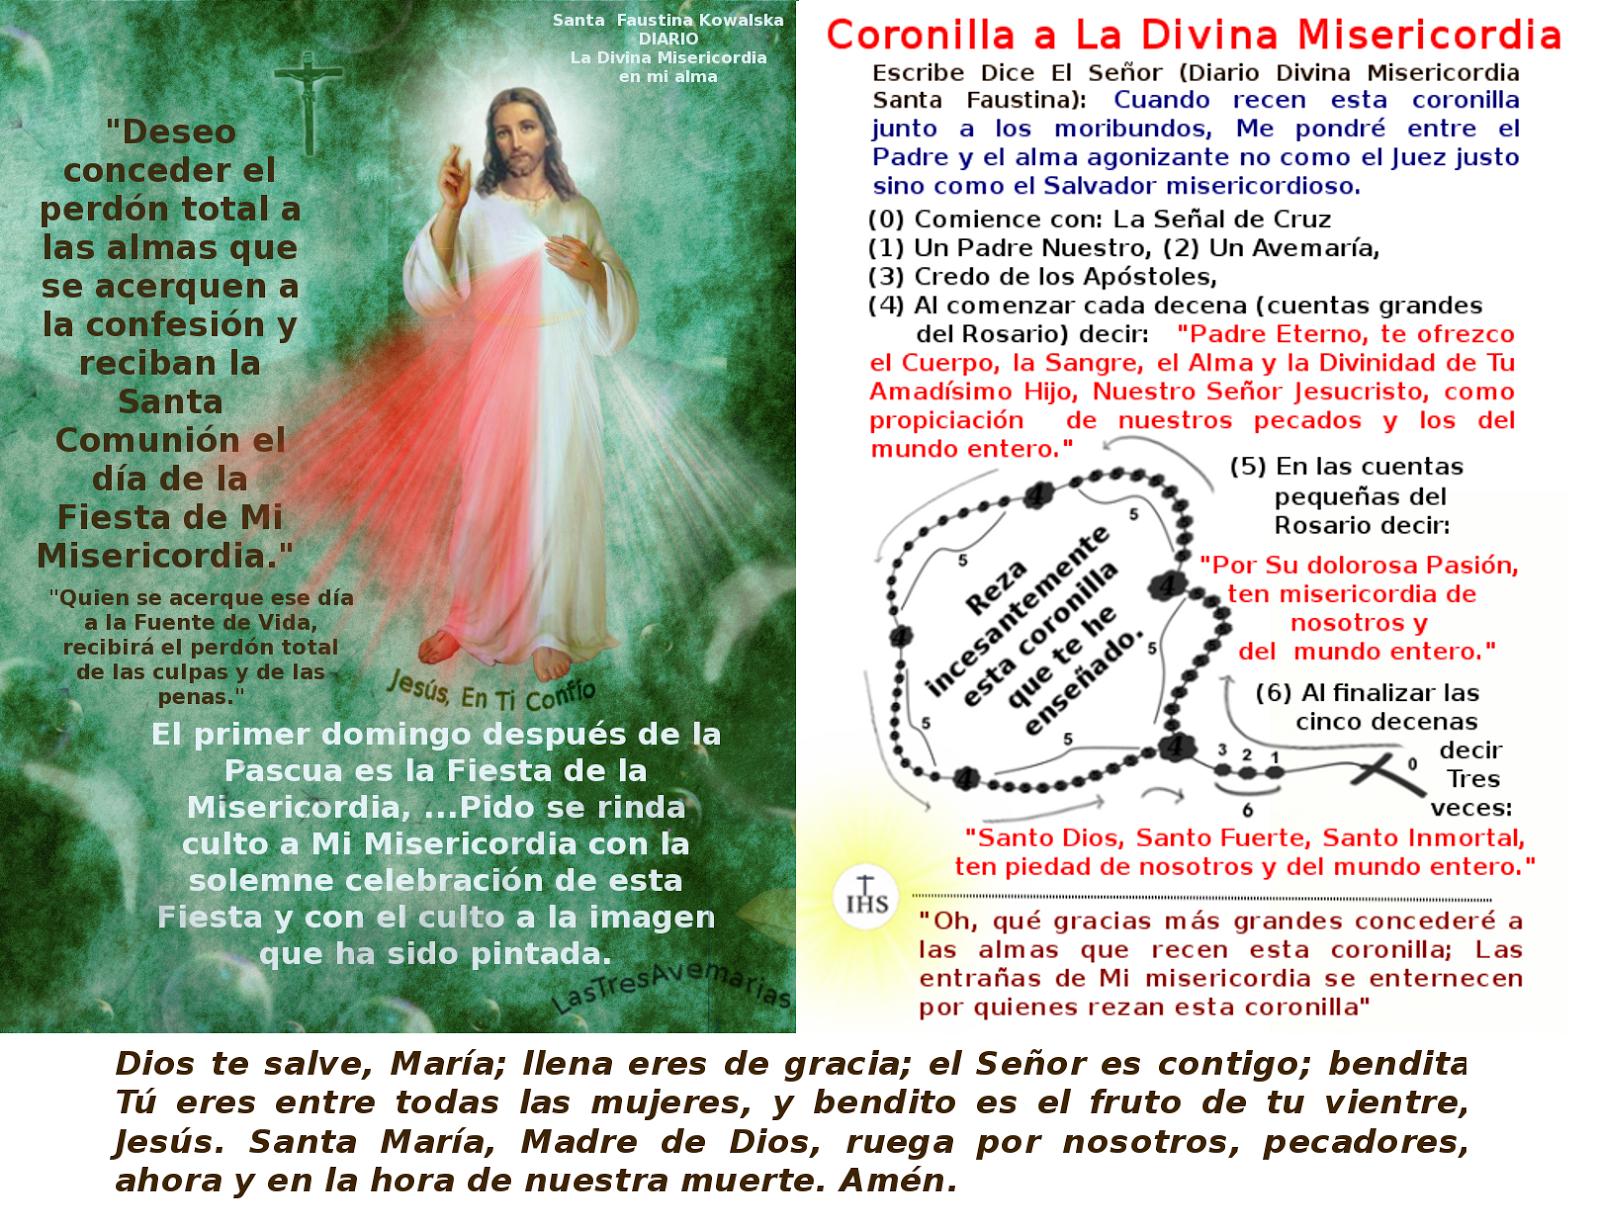 foto de la divina misericordia con la coronilla de la divina misericordia